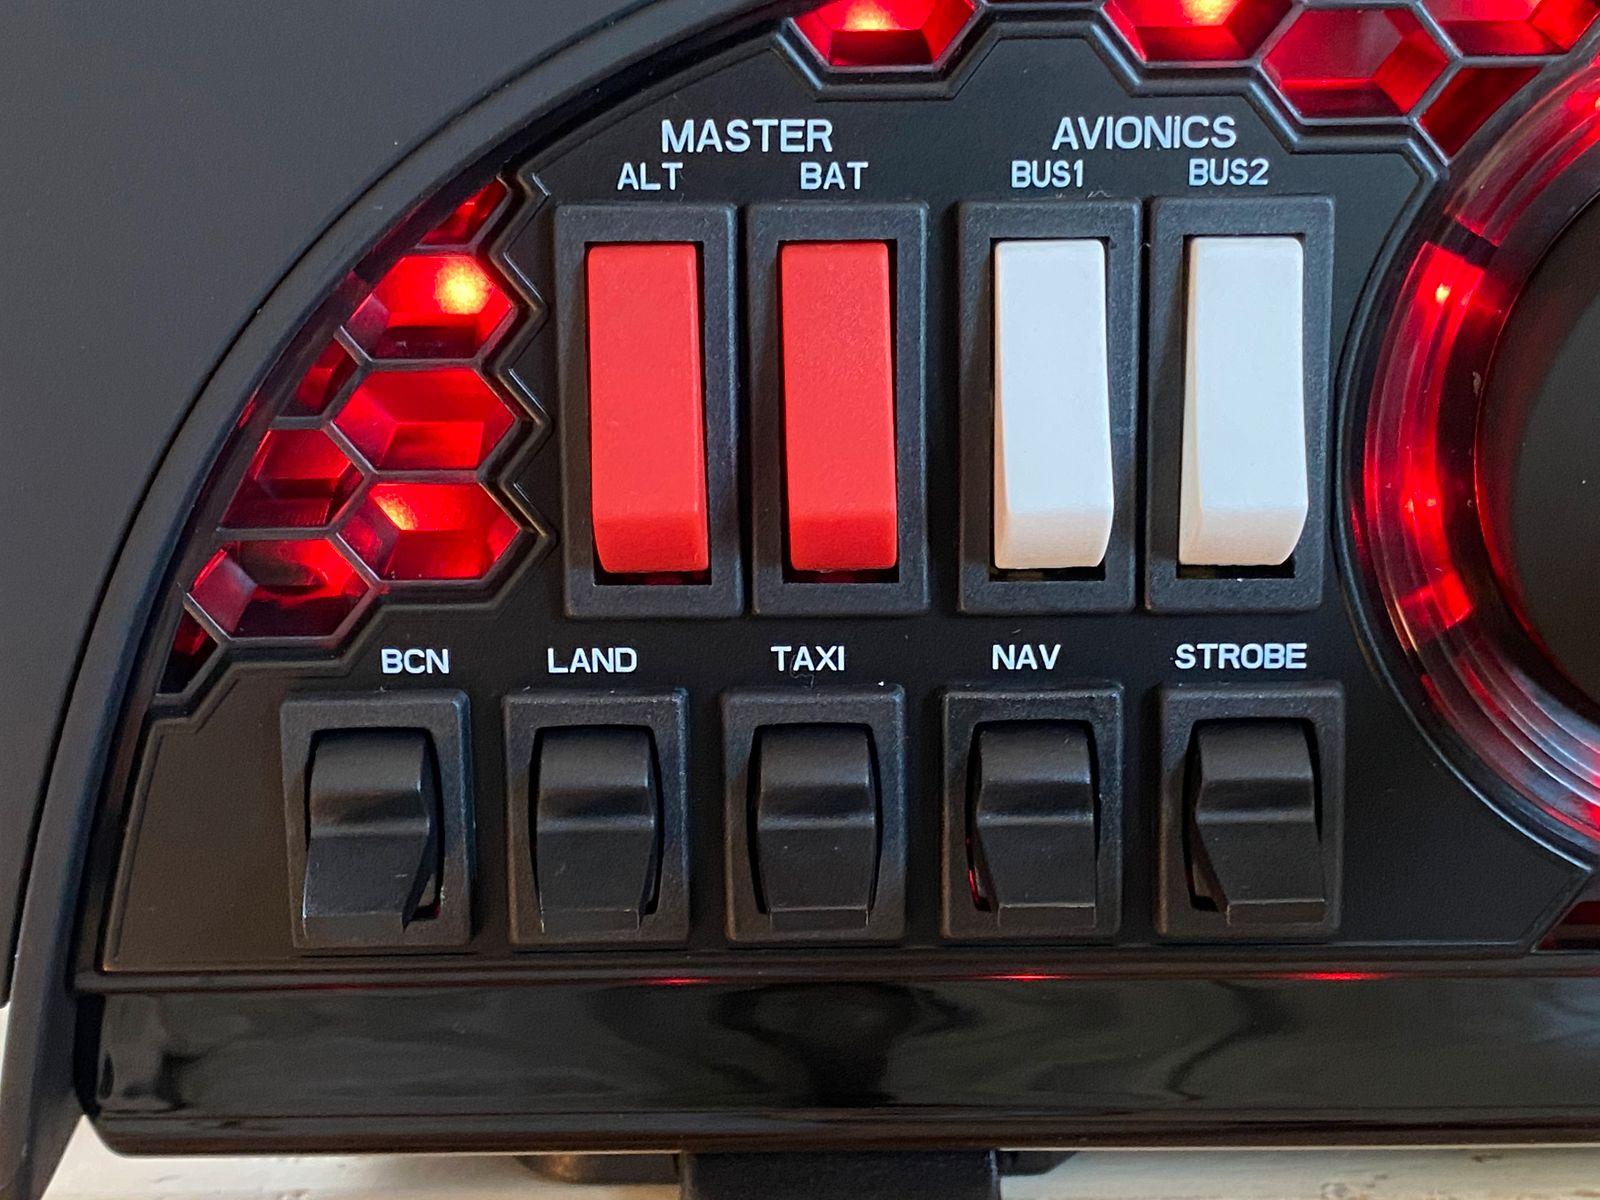 Joysticks / Honeycomb Alpha Flight Controls